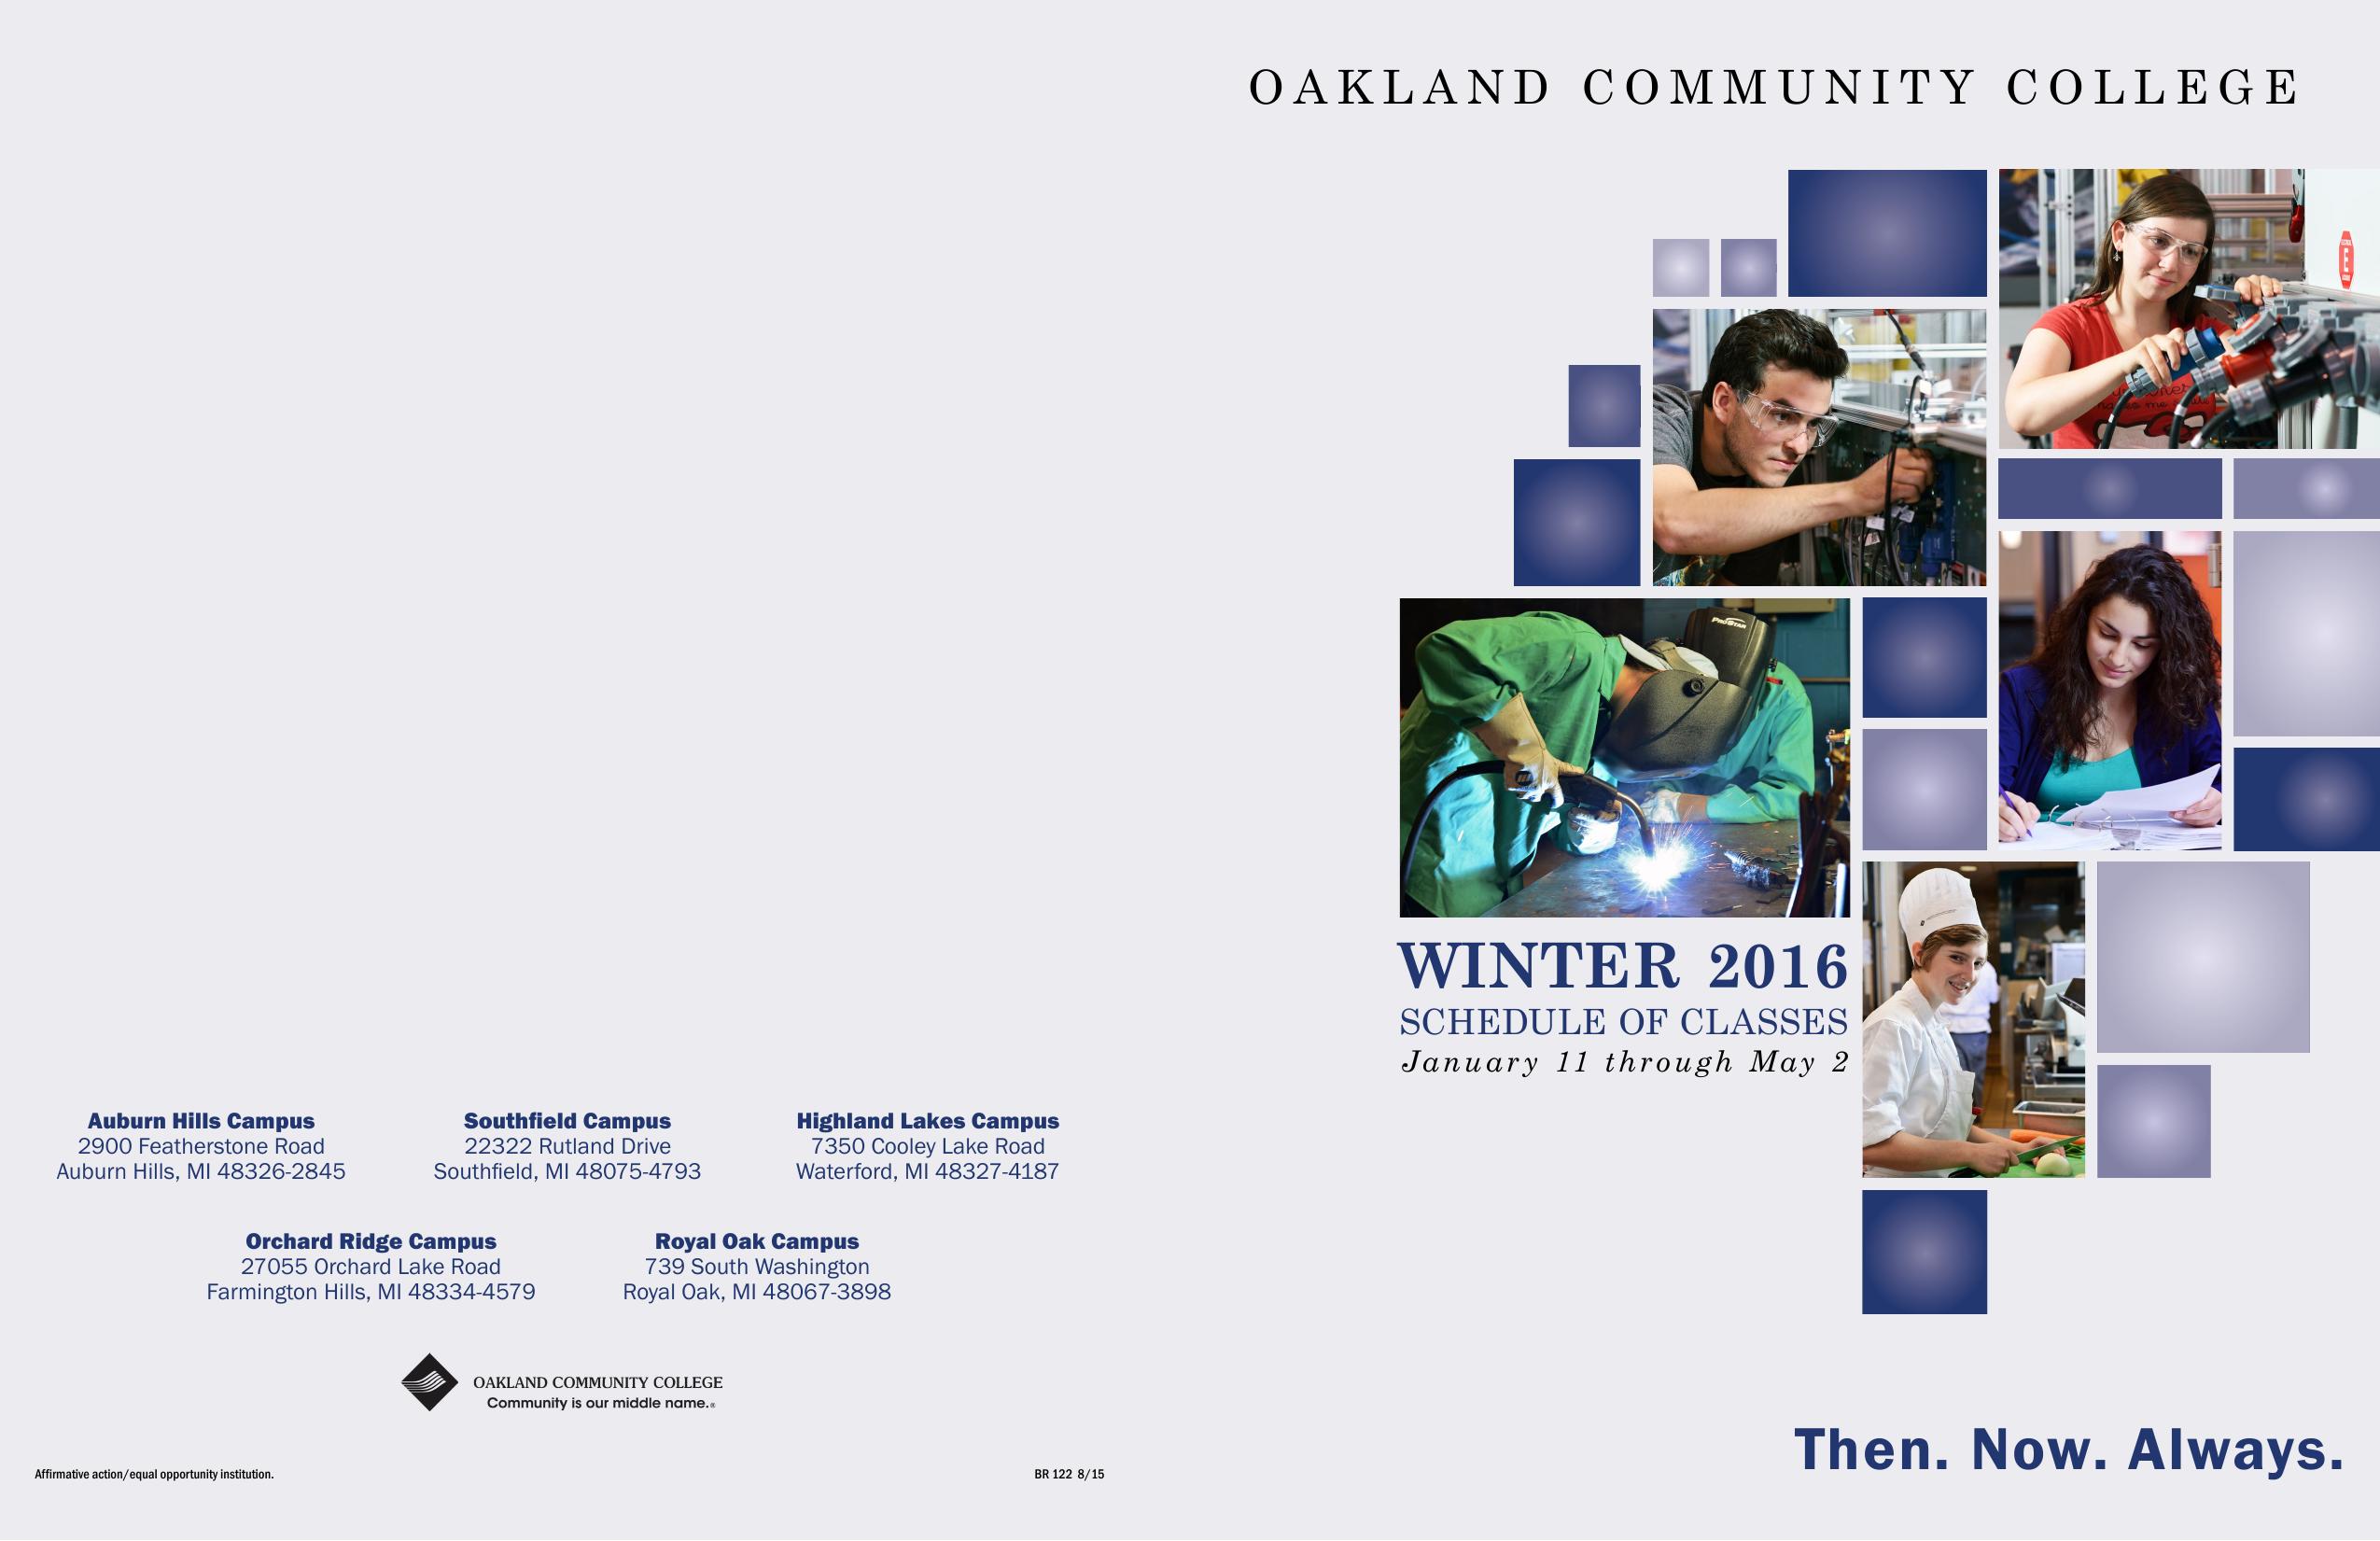 Occ Southfield Campus Map.Winter 2016 Scehdule Of Classes